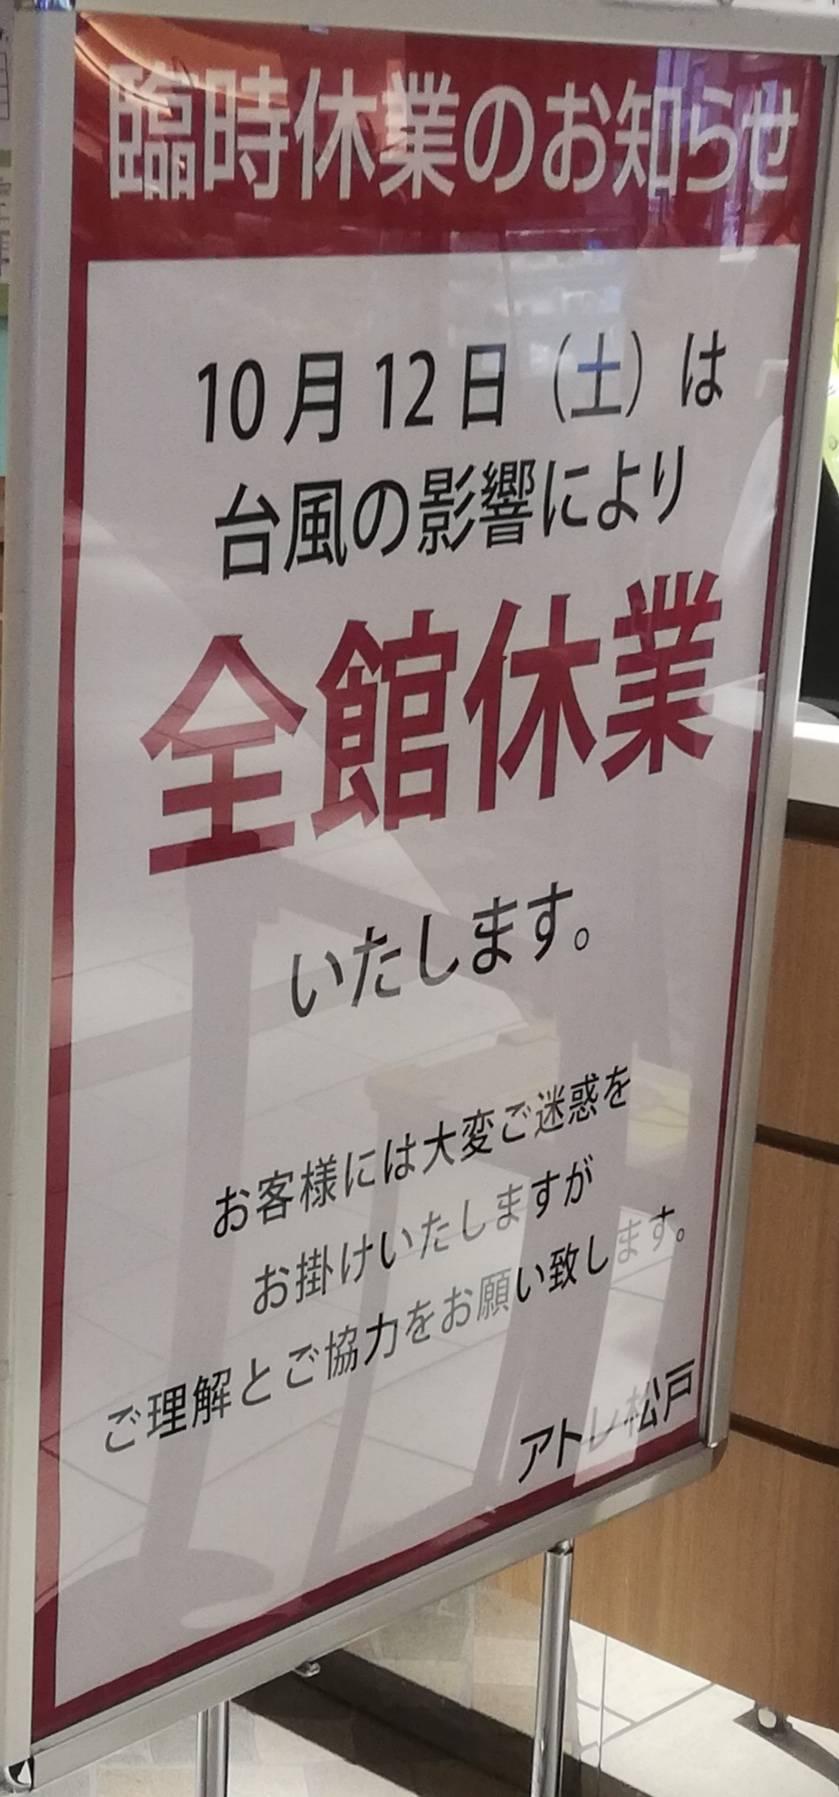 アトレ松戸13日営業臨時休館